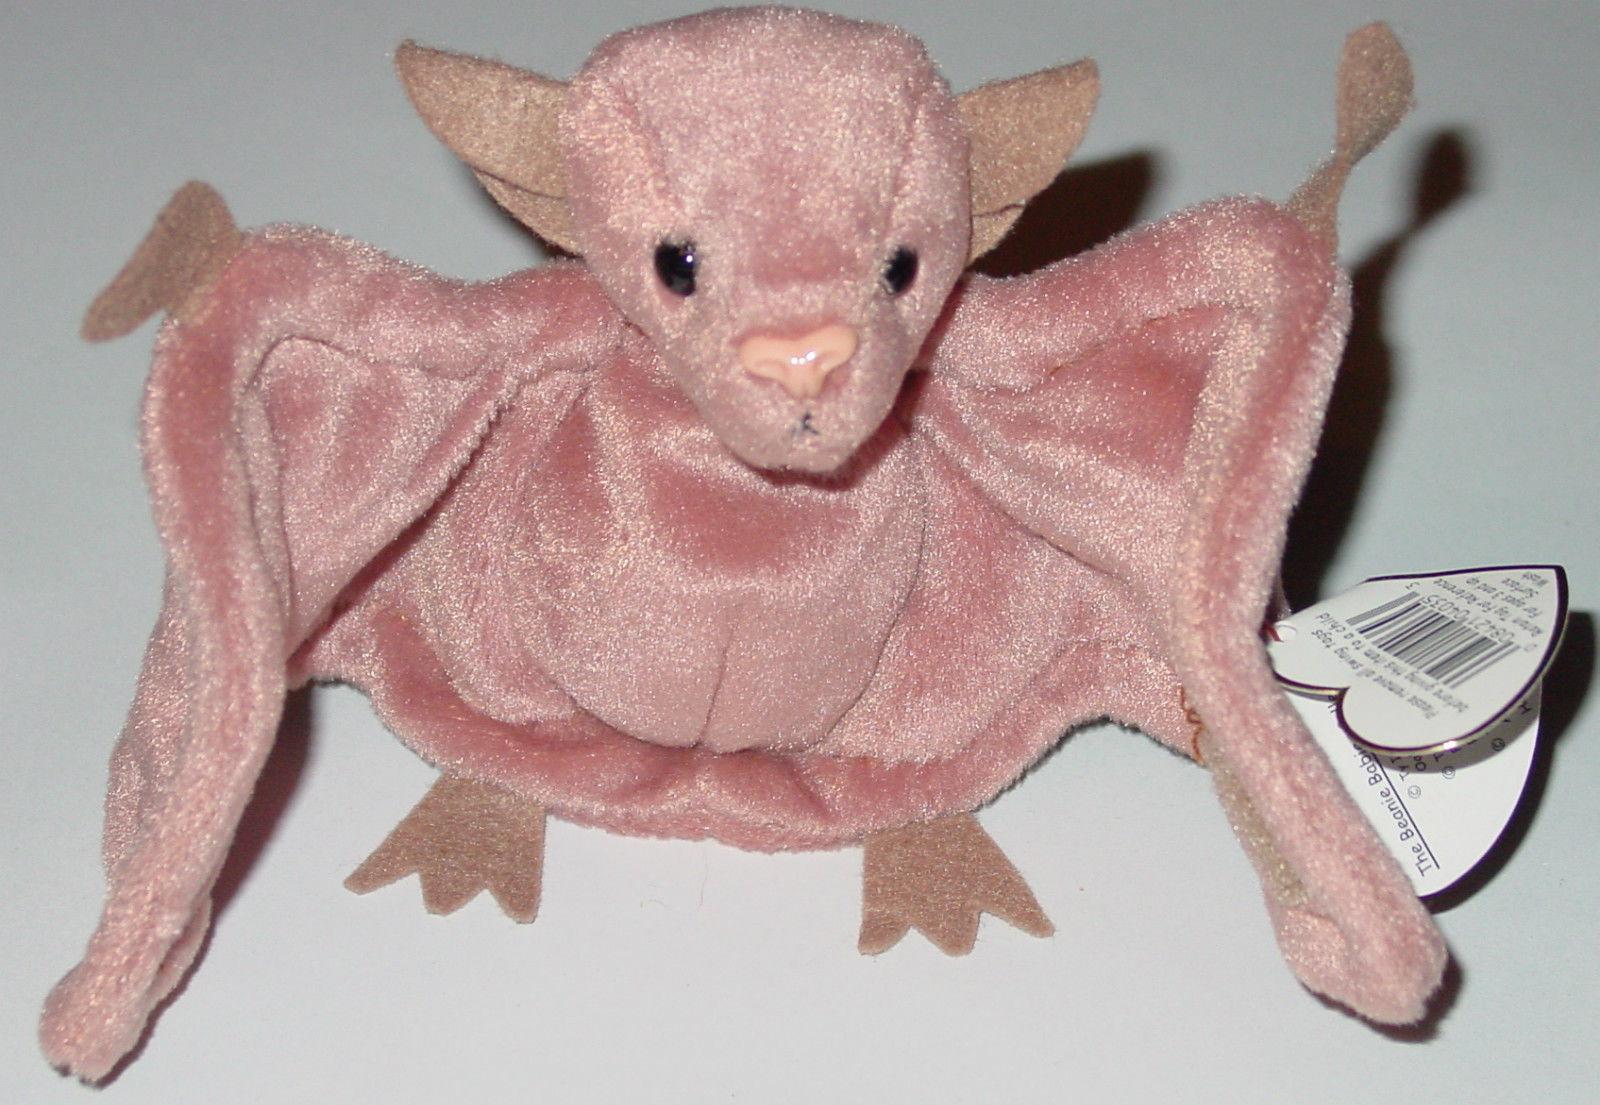 TY BEANIE BABIES Batty Bat #4035 1997 BEANBAG PLUSH